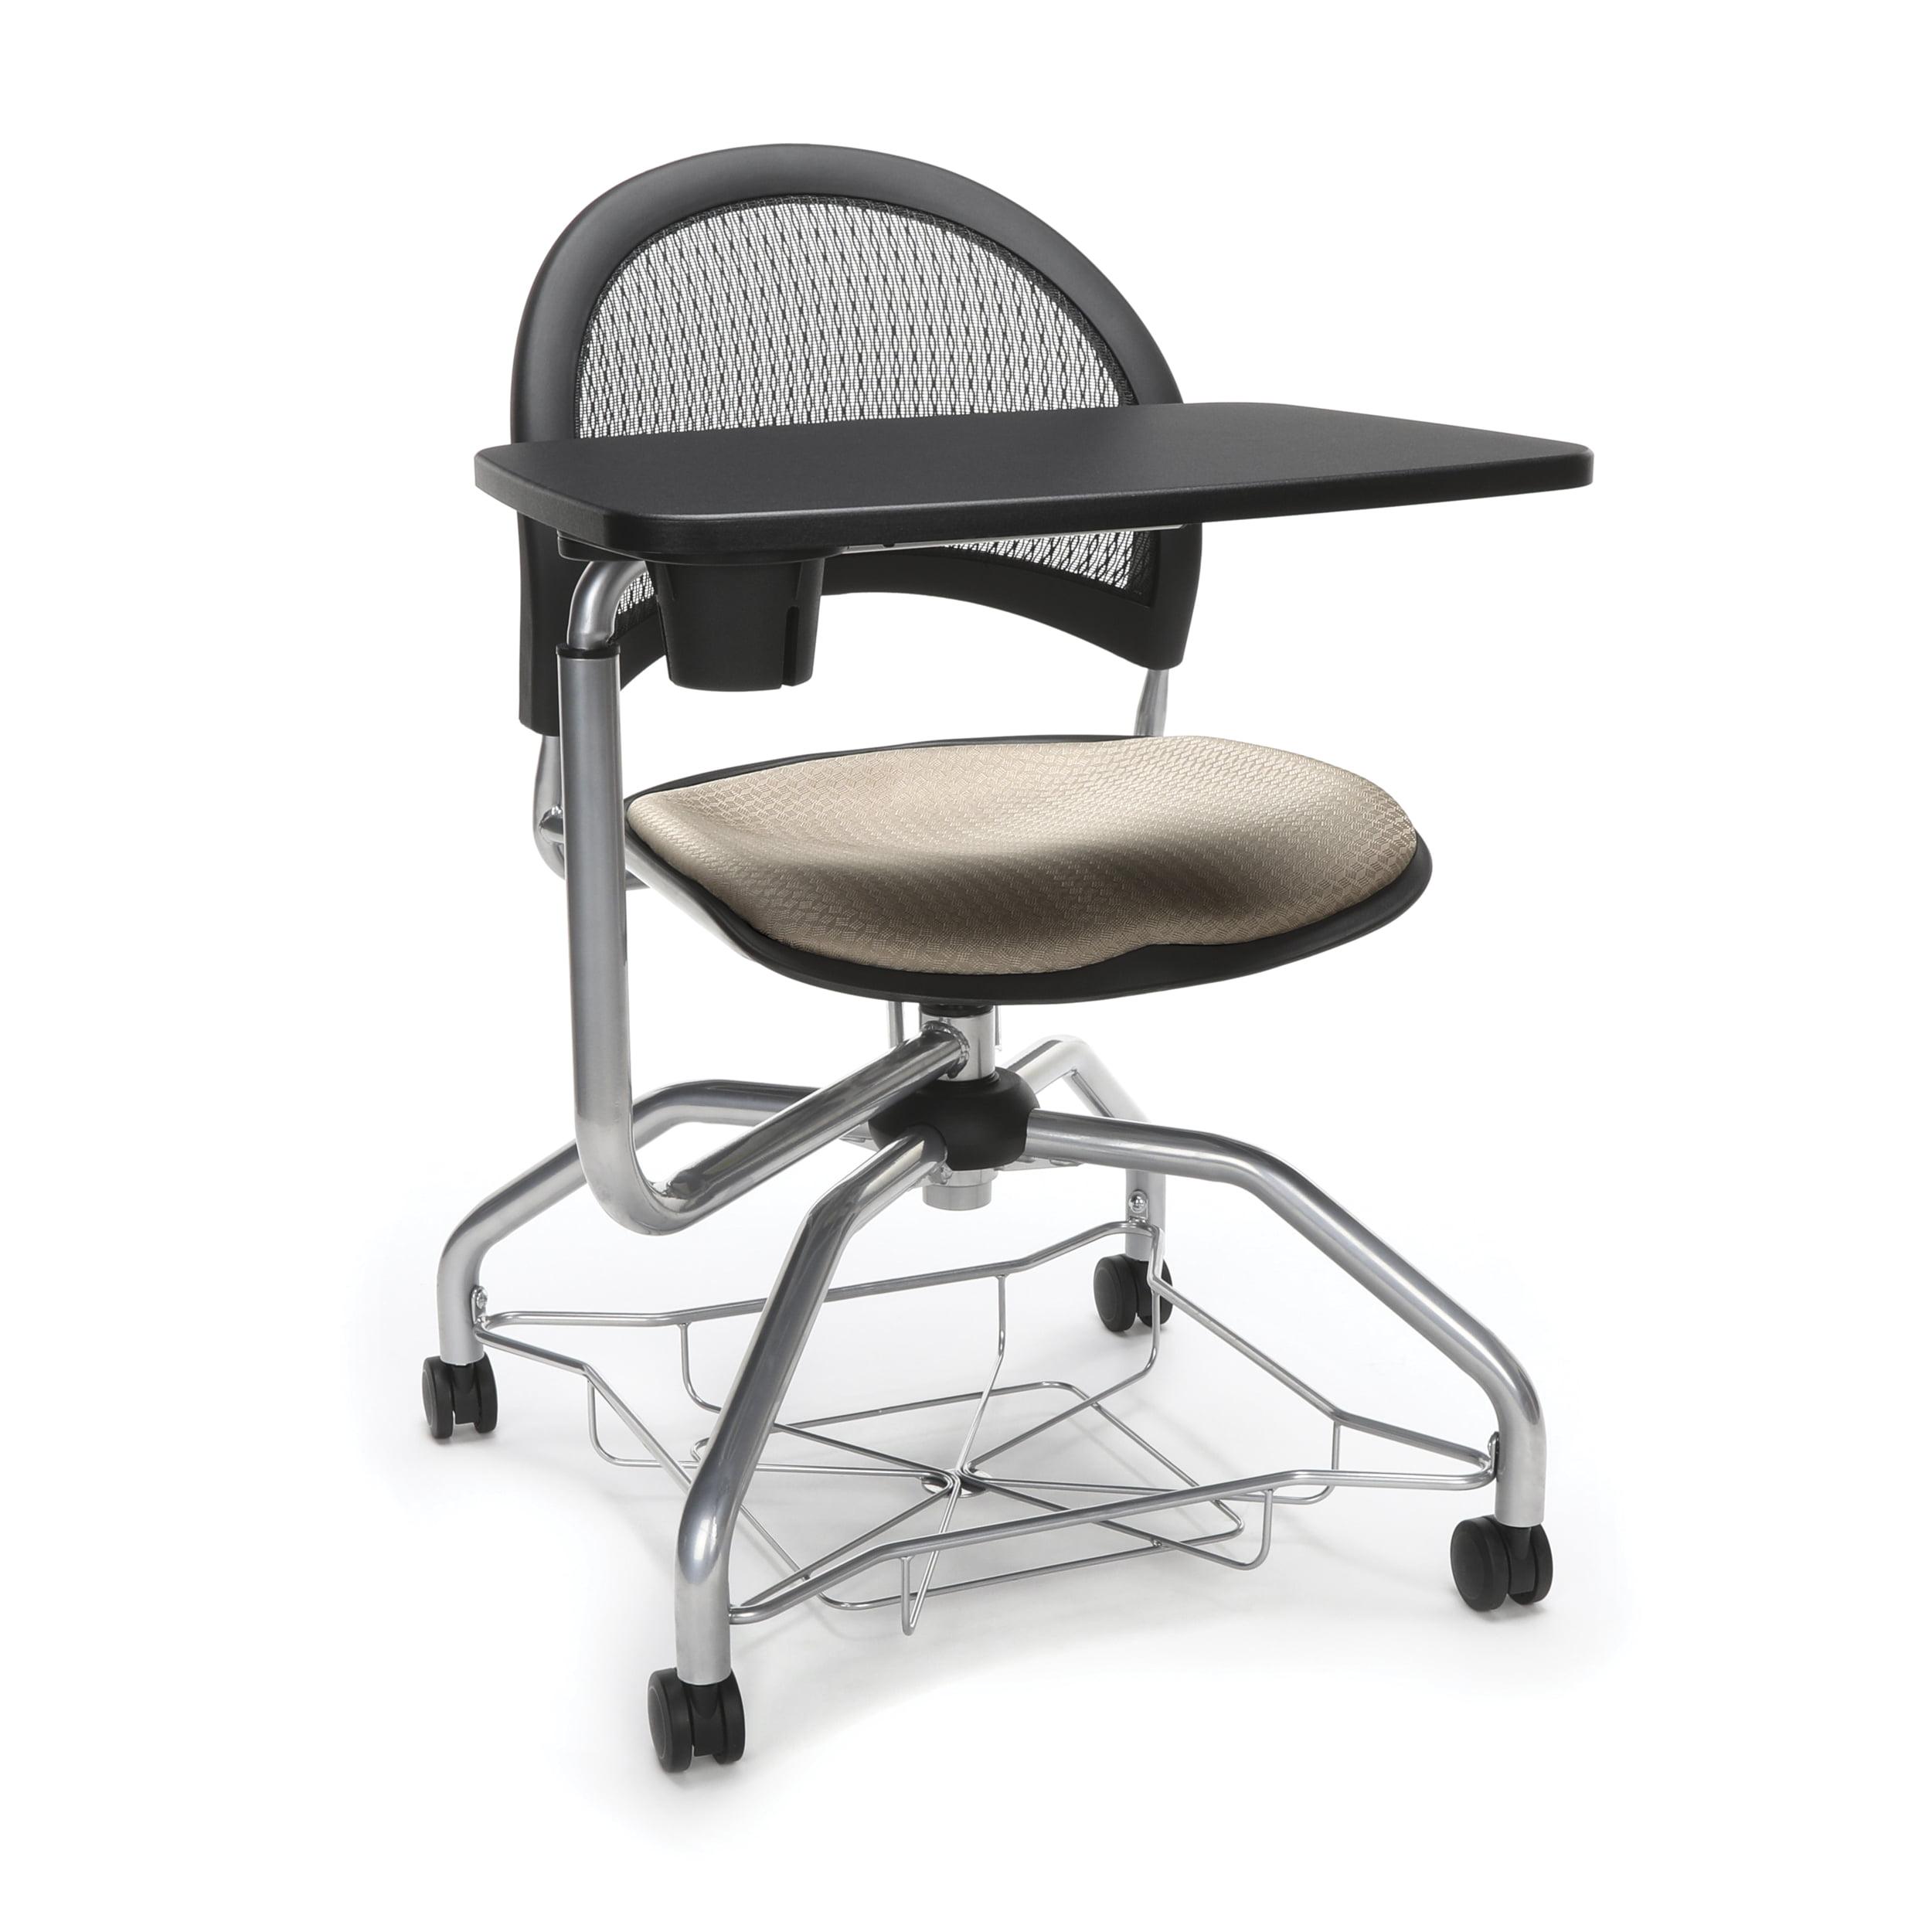 Ofminc School Furniture StarMoon Series 300 Lbs Swivel Mesh Back Foresee Shamrock Green Tablet Under-Seat Basket Chair